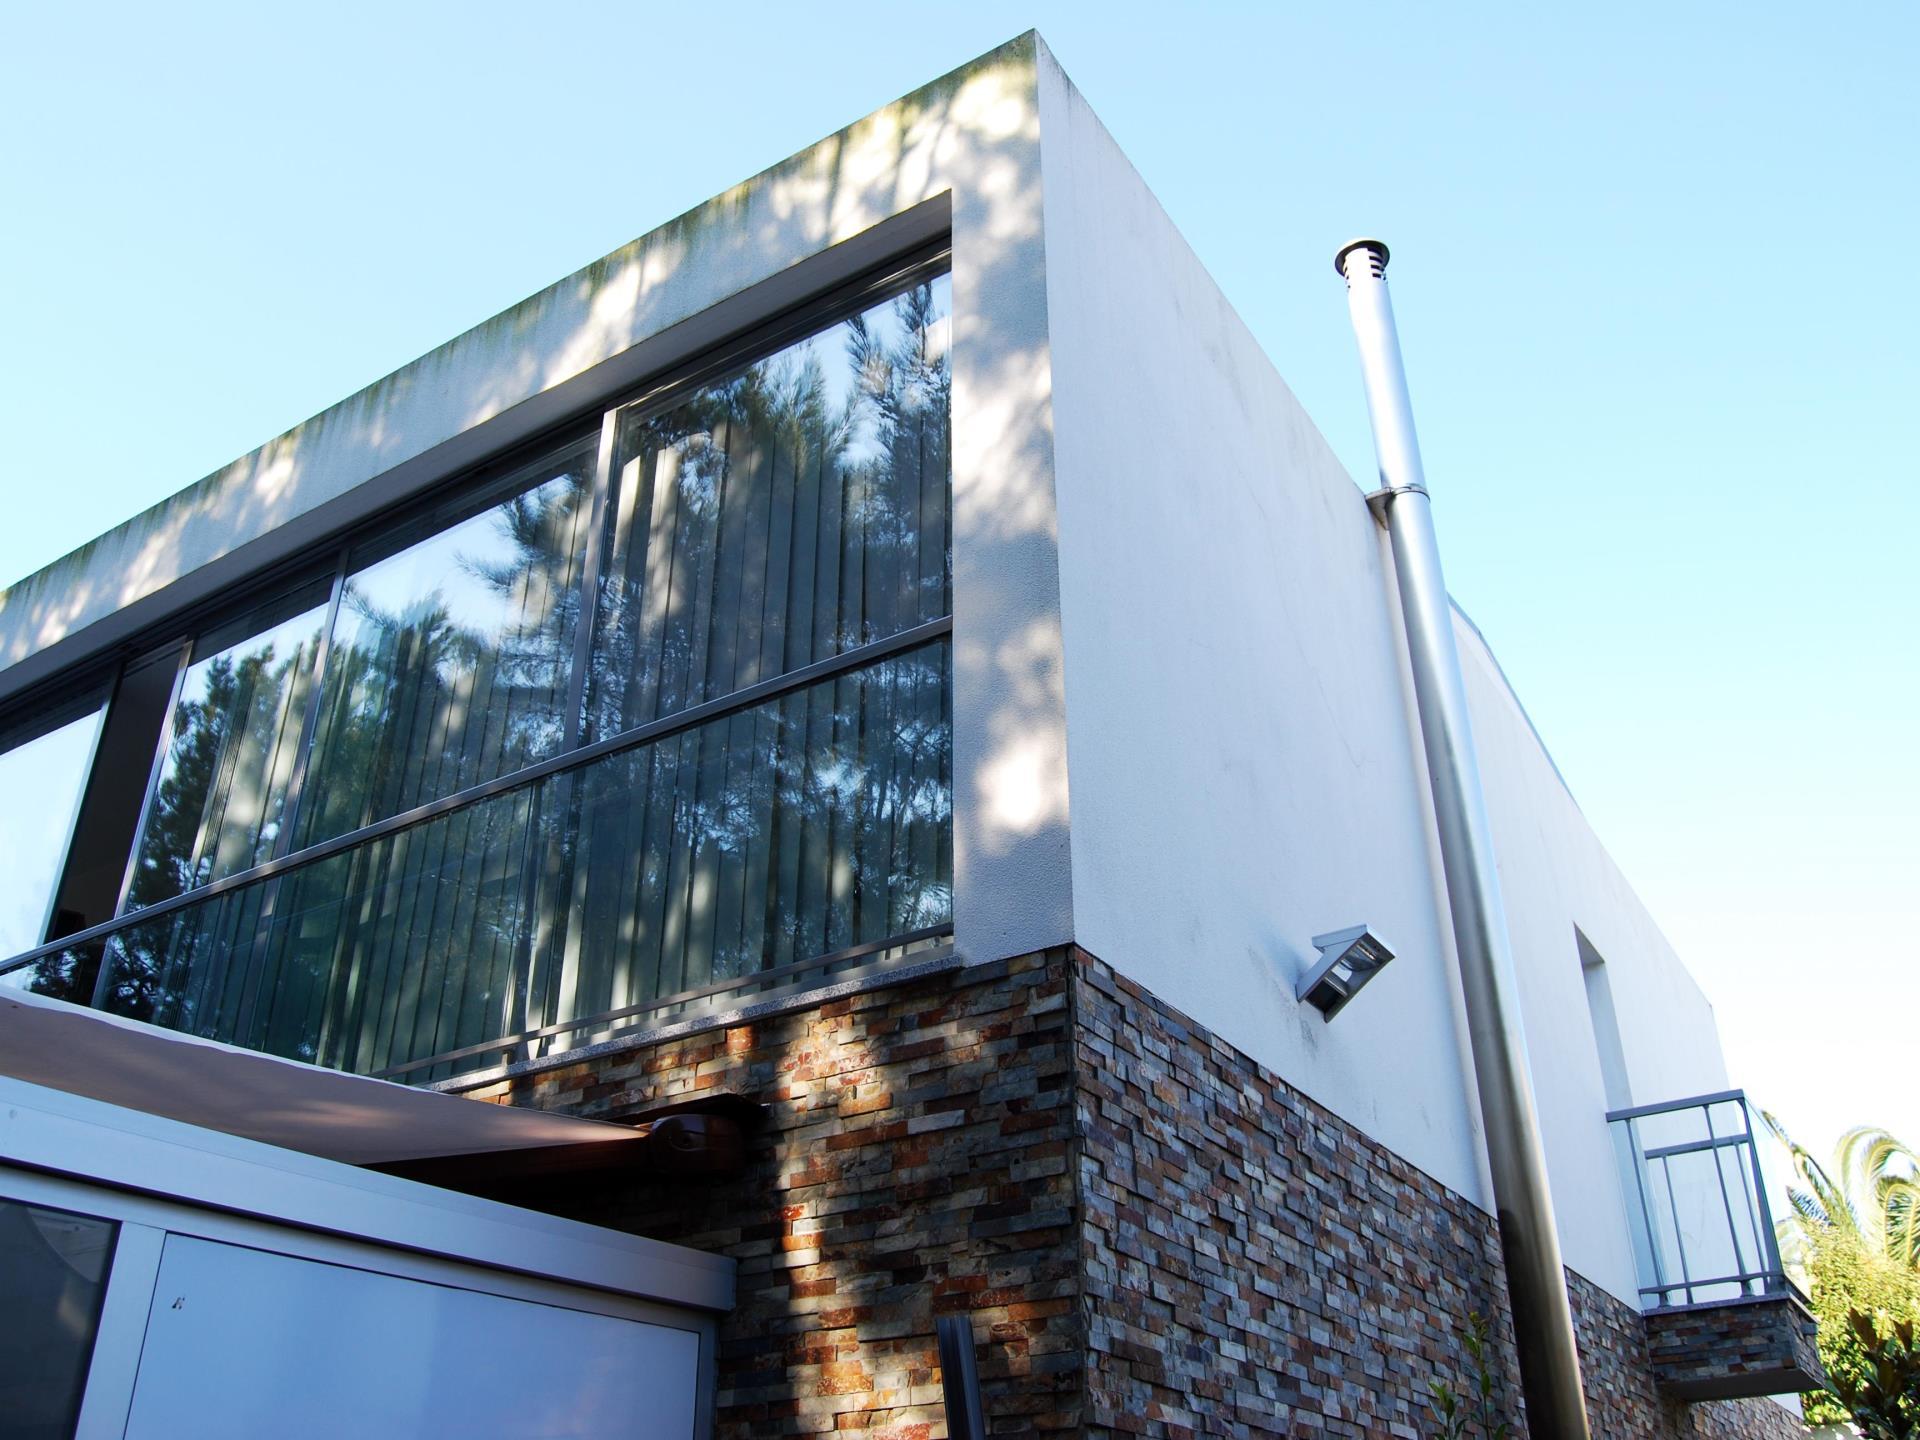 Villa per Vendita alle ore Detached house, 4 bedrooms, for Sale Cascais, Lisbona Portogallo